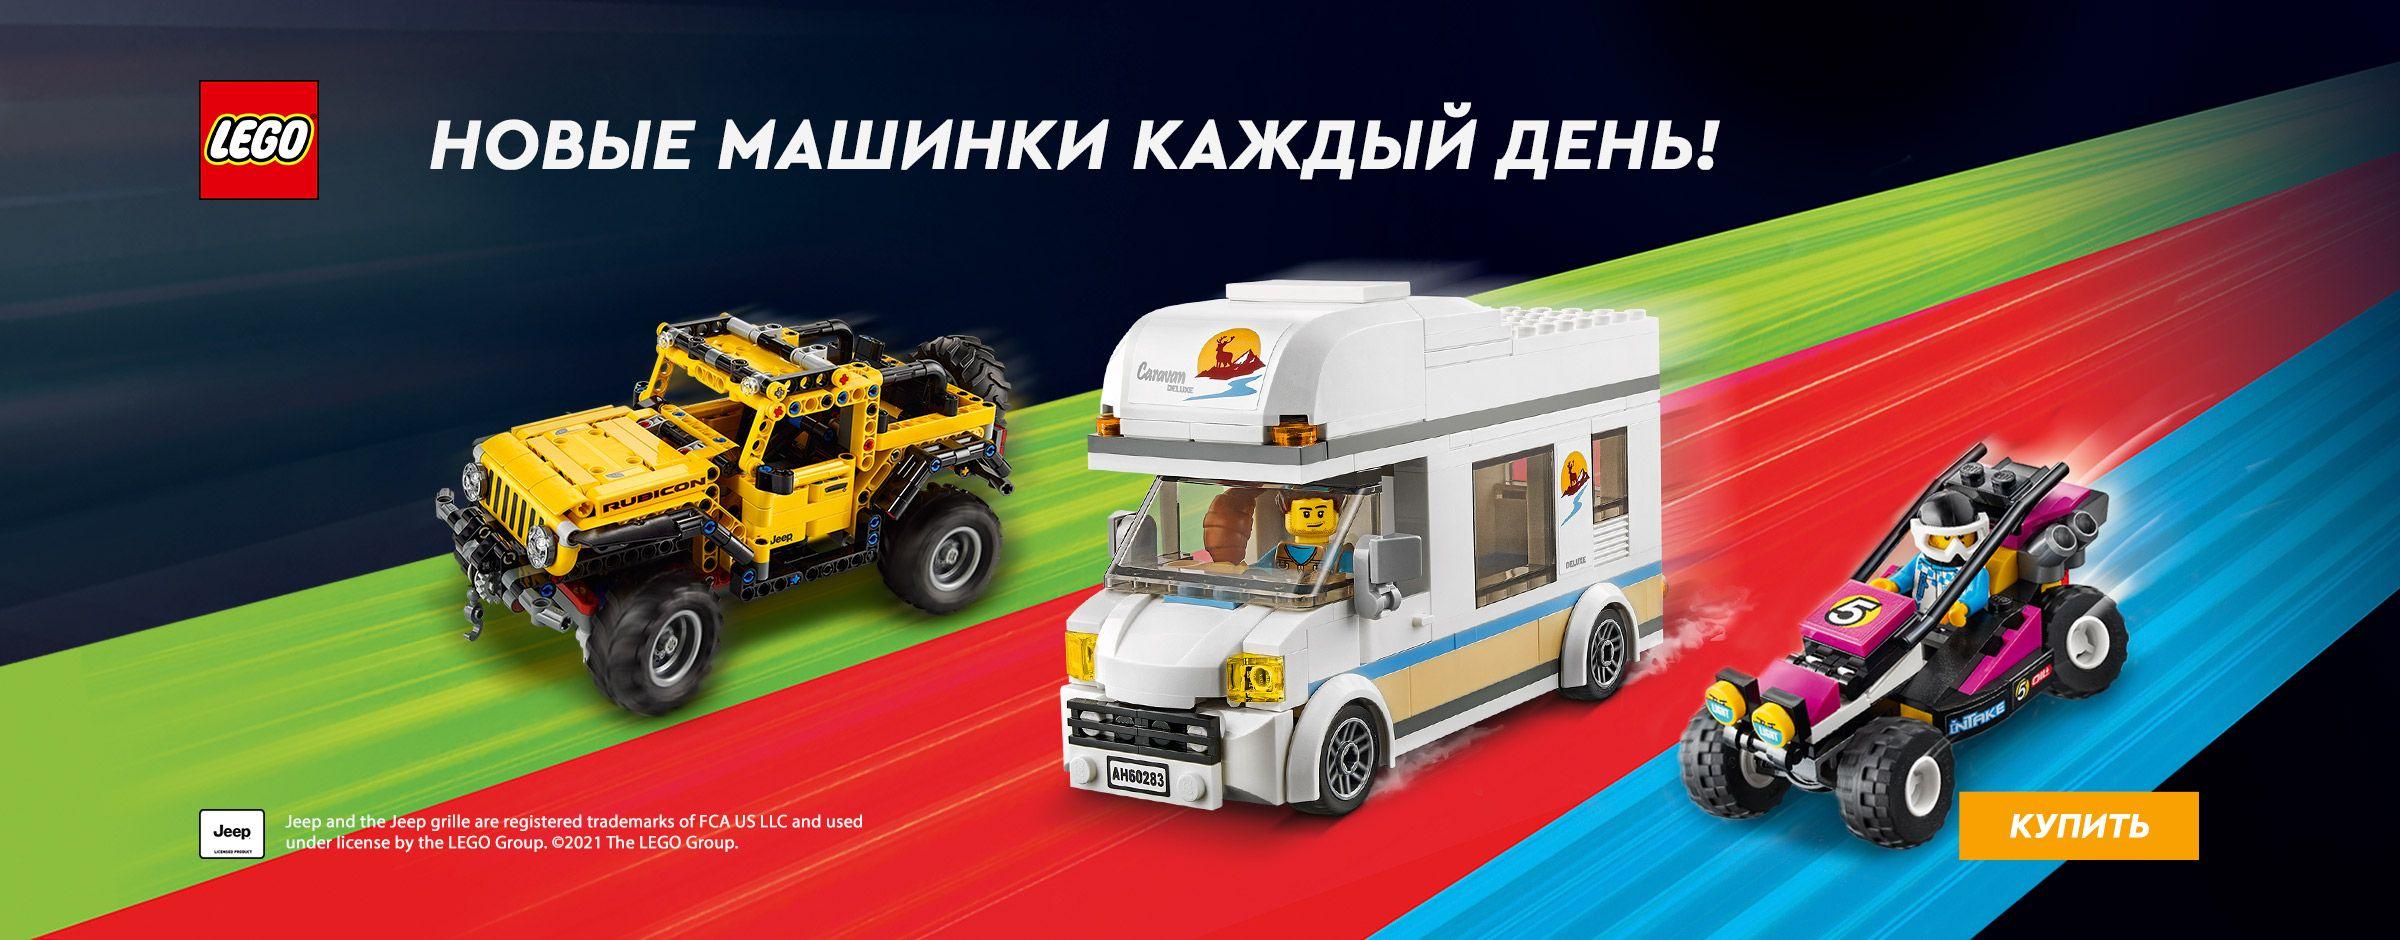 LEGO транспорт SIS